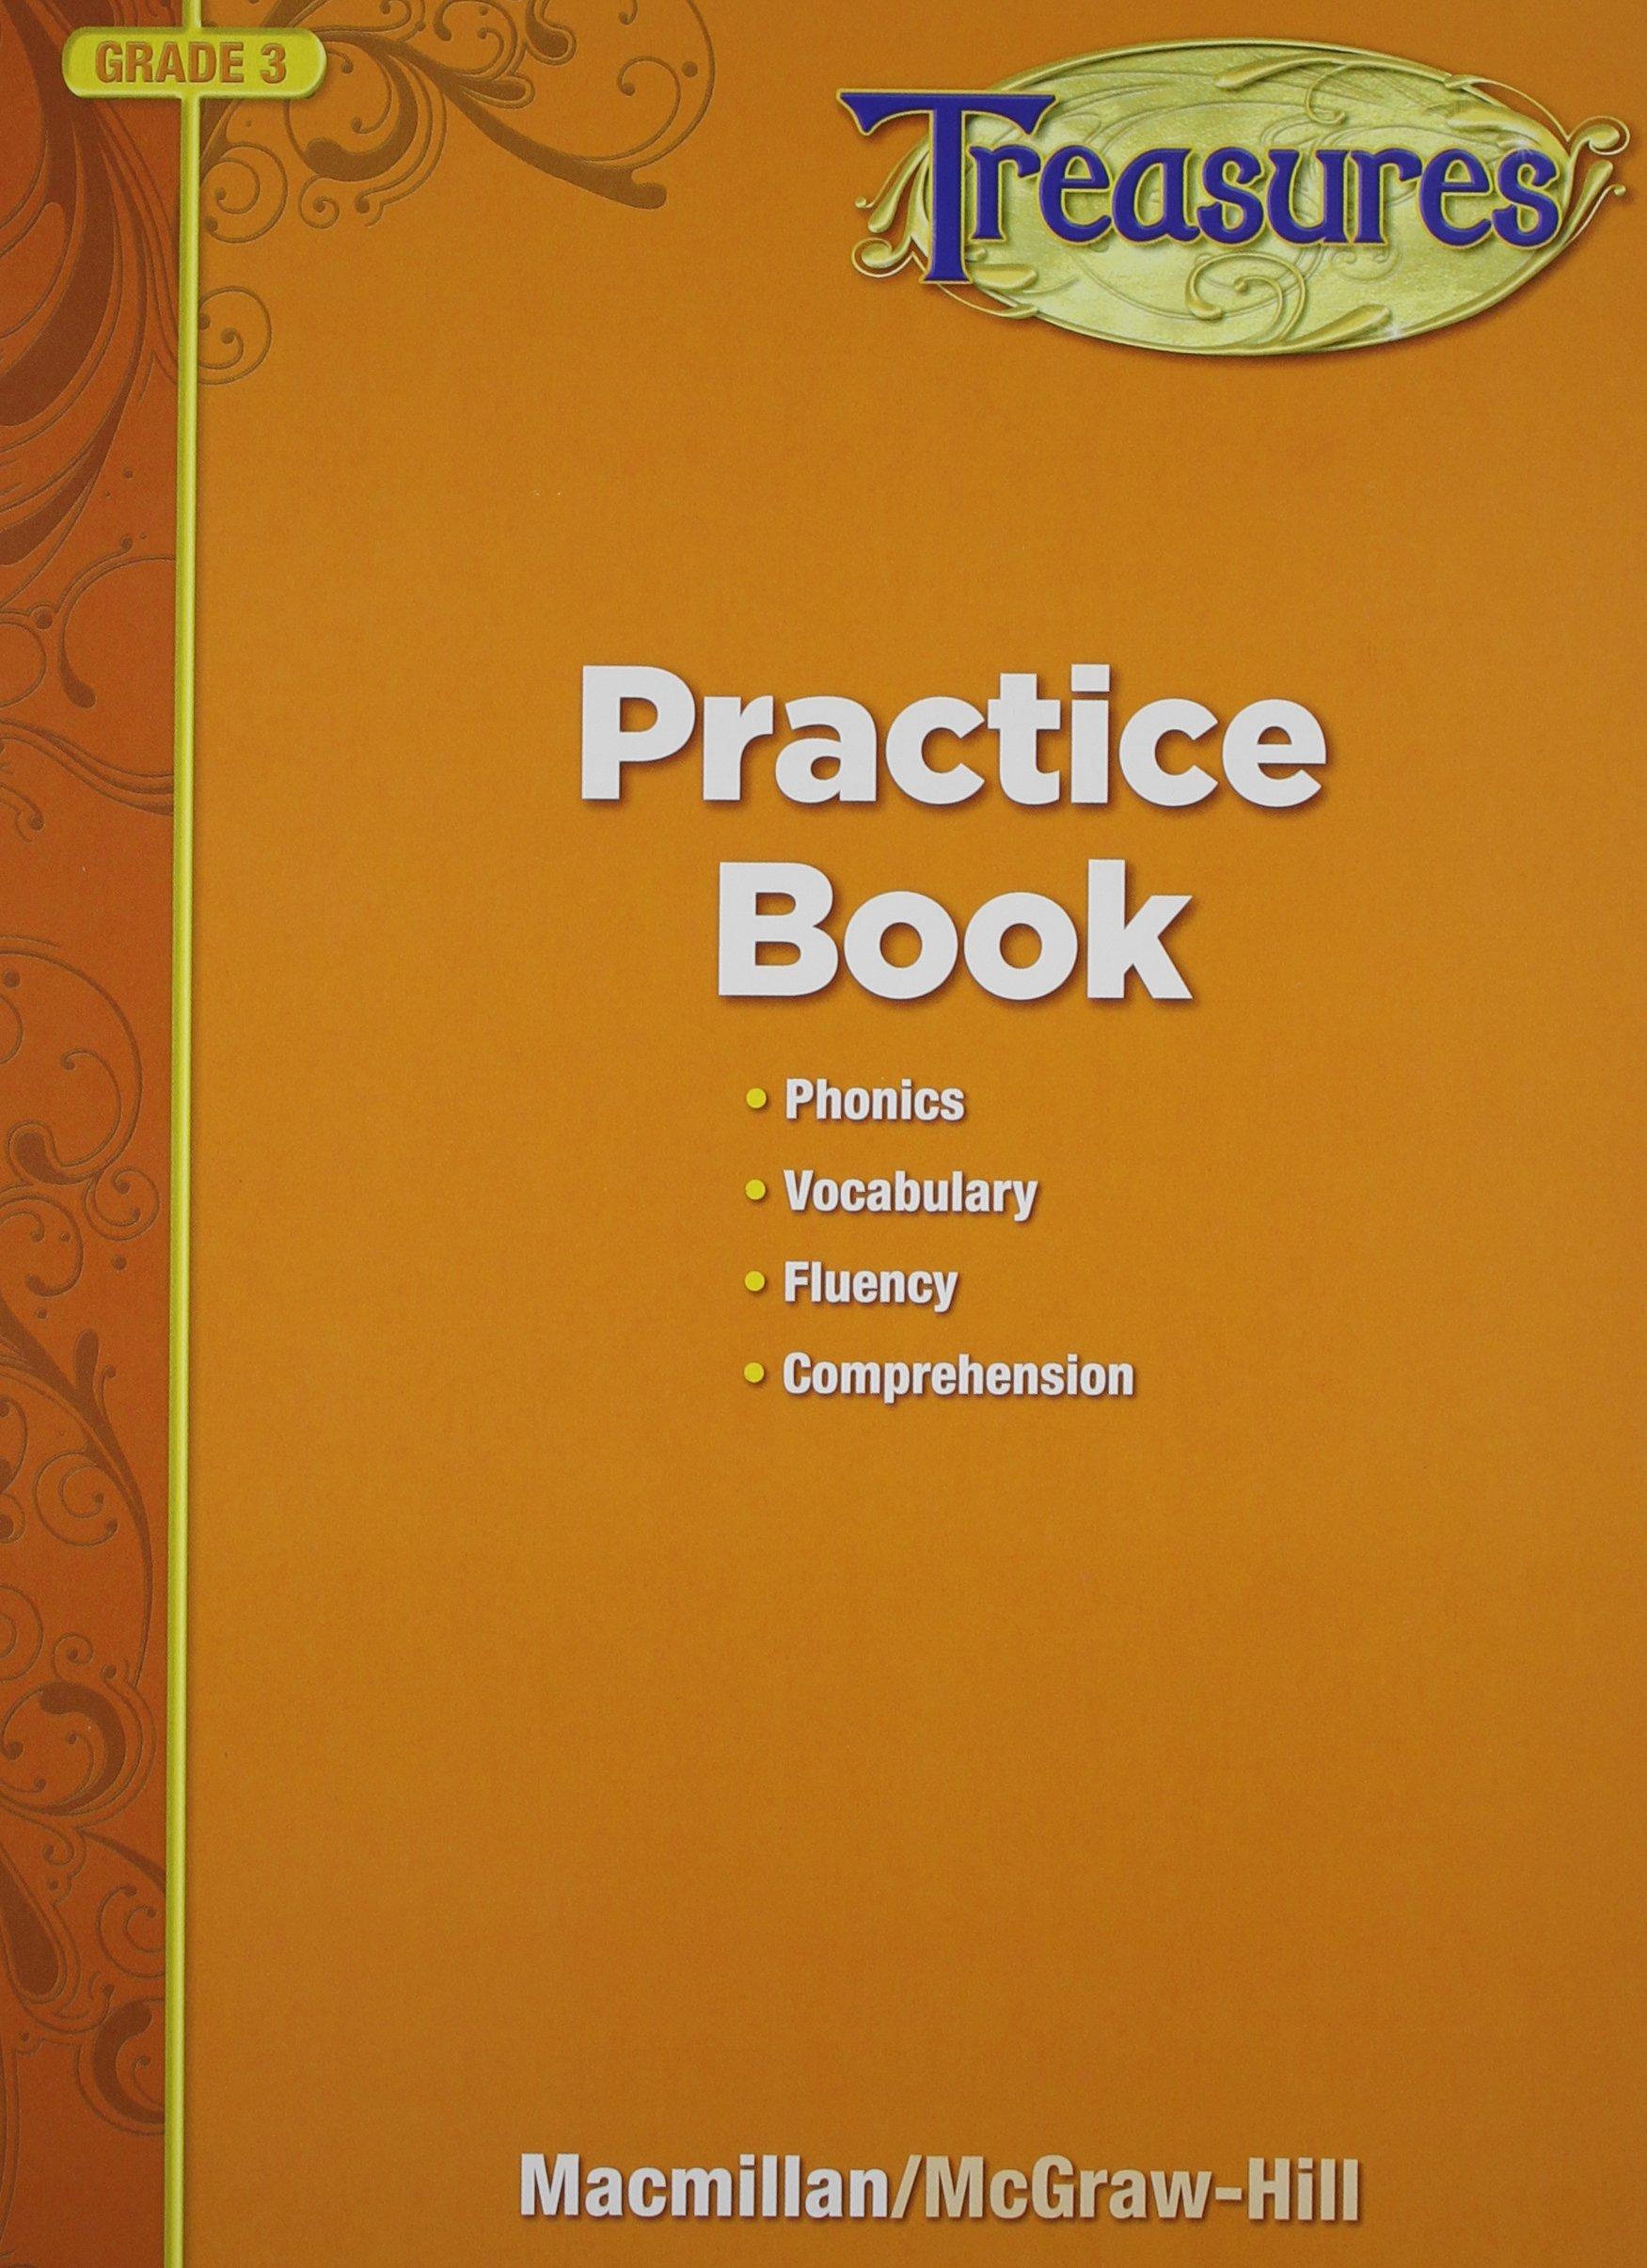 Practice Book: Phonics - Vocabulary - Fluency